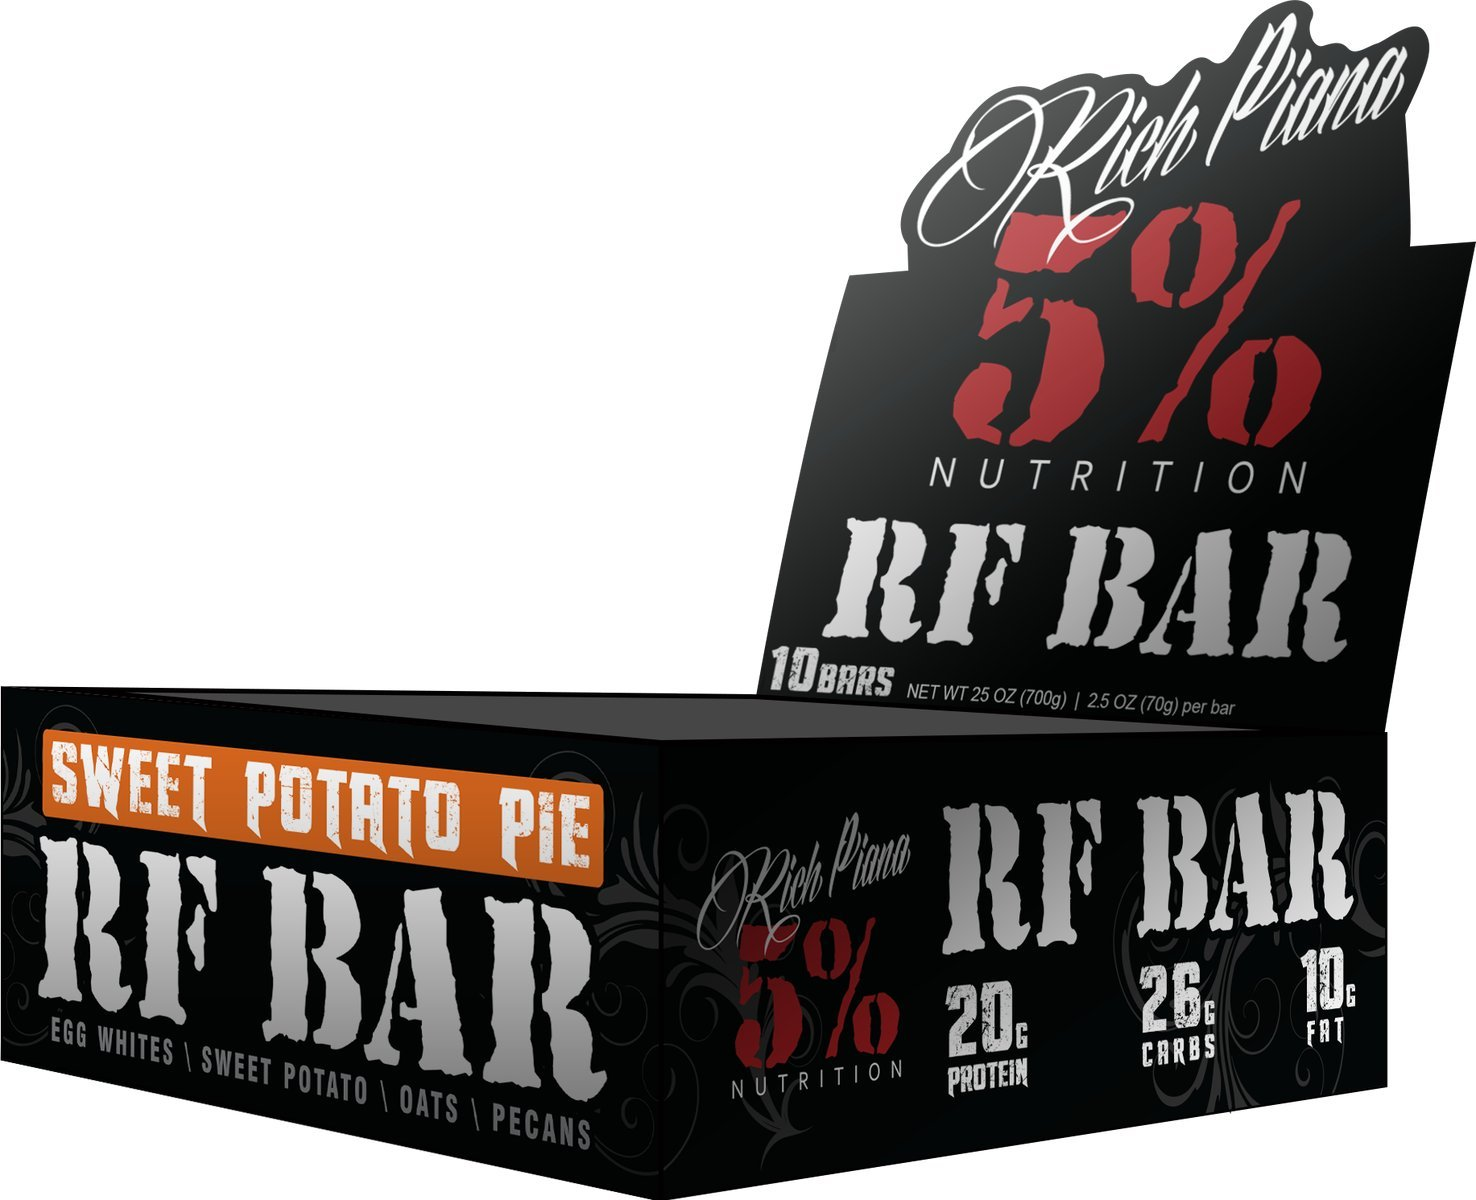 Rich Piana 5% Nutrition, RF Bar Sweet Potato Pie Flavor (10 Count), 20g Protein 70g Serving Size